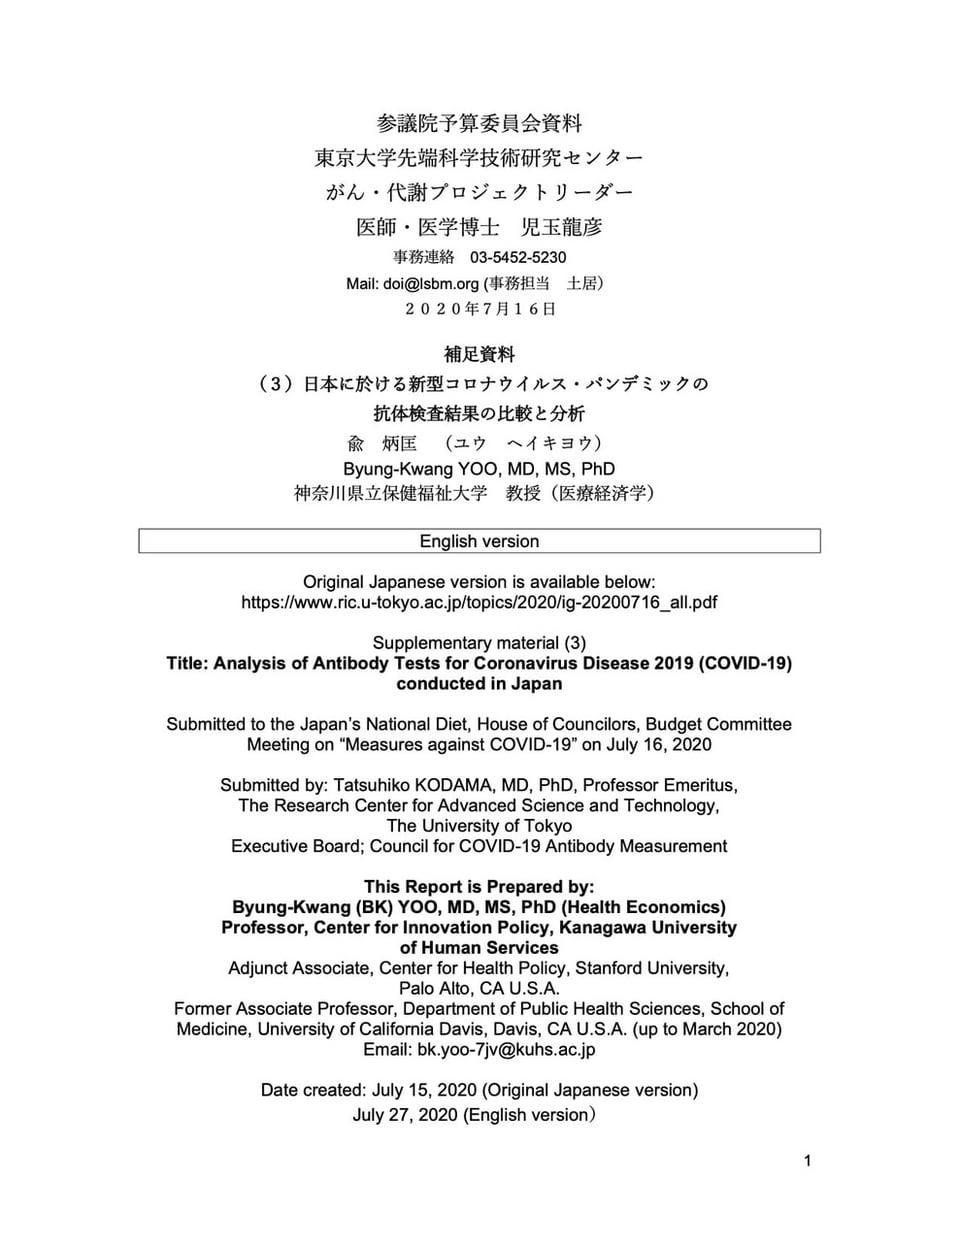 Prof. Kodama_Diet testimony_English_posted_BK Yoo